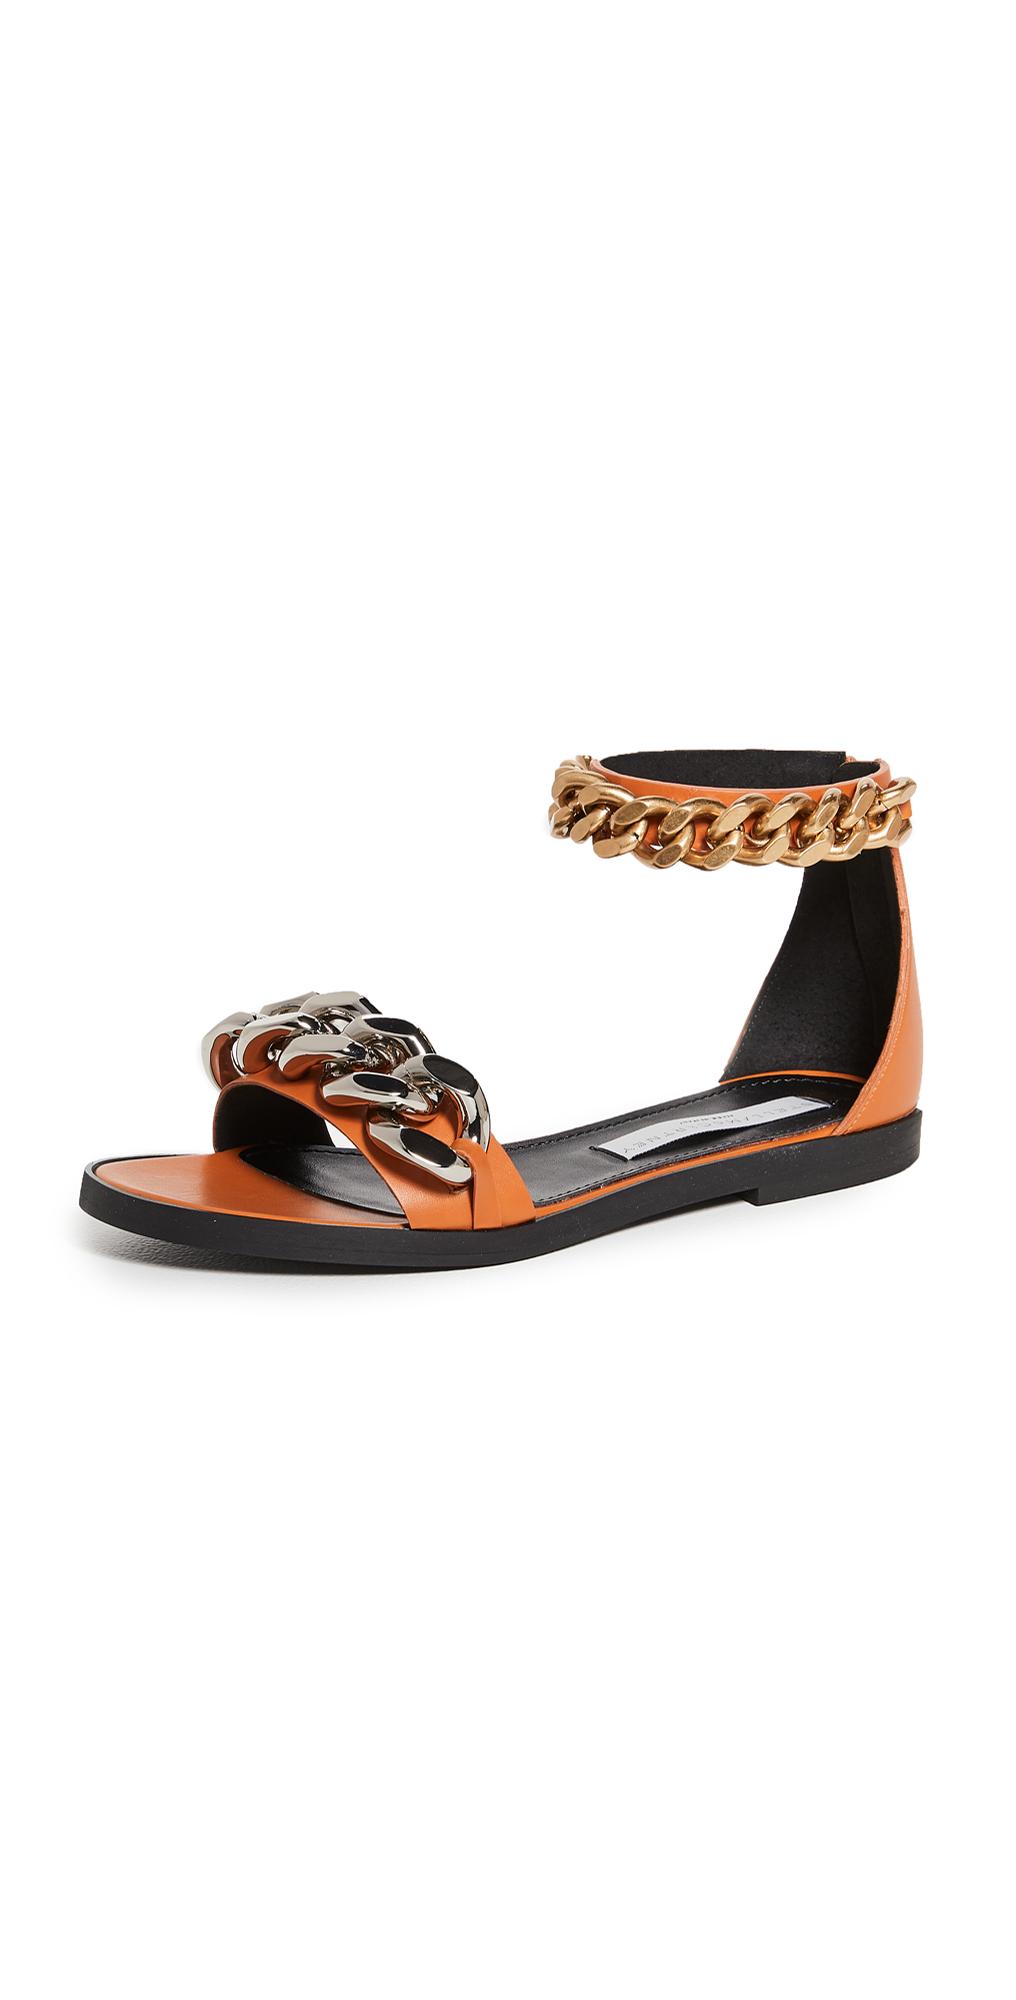 Stella McCartney Falabella Sandals